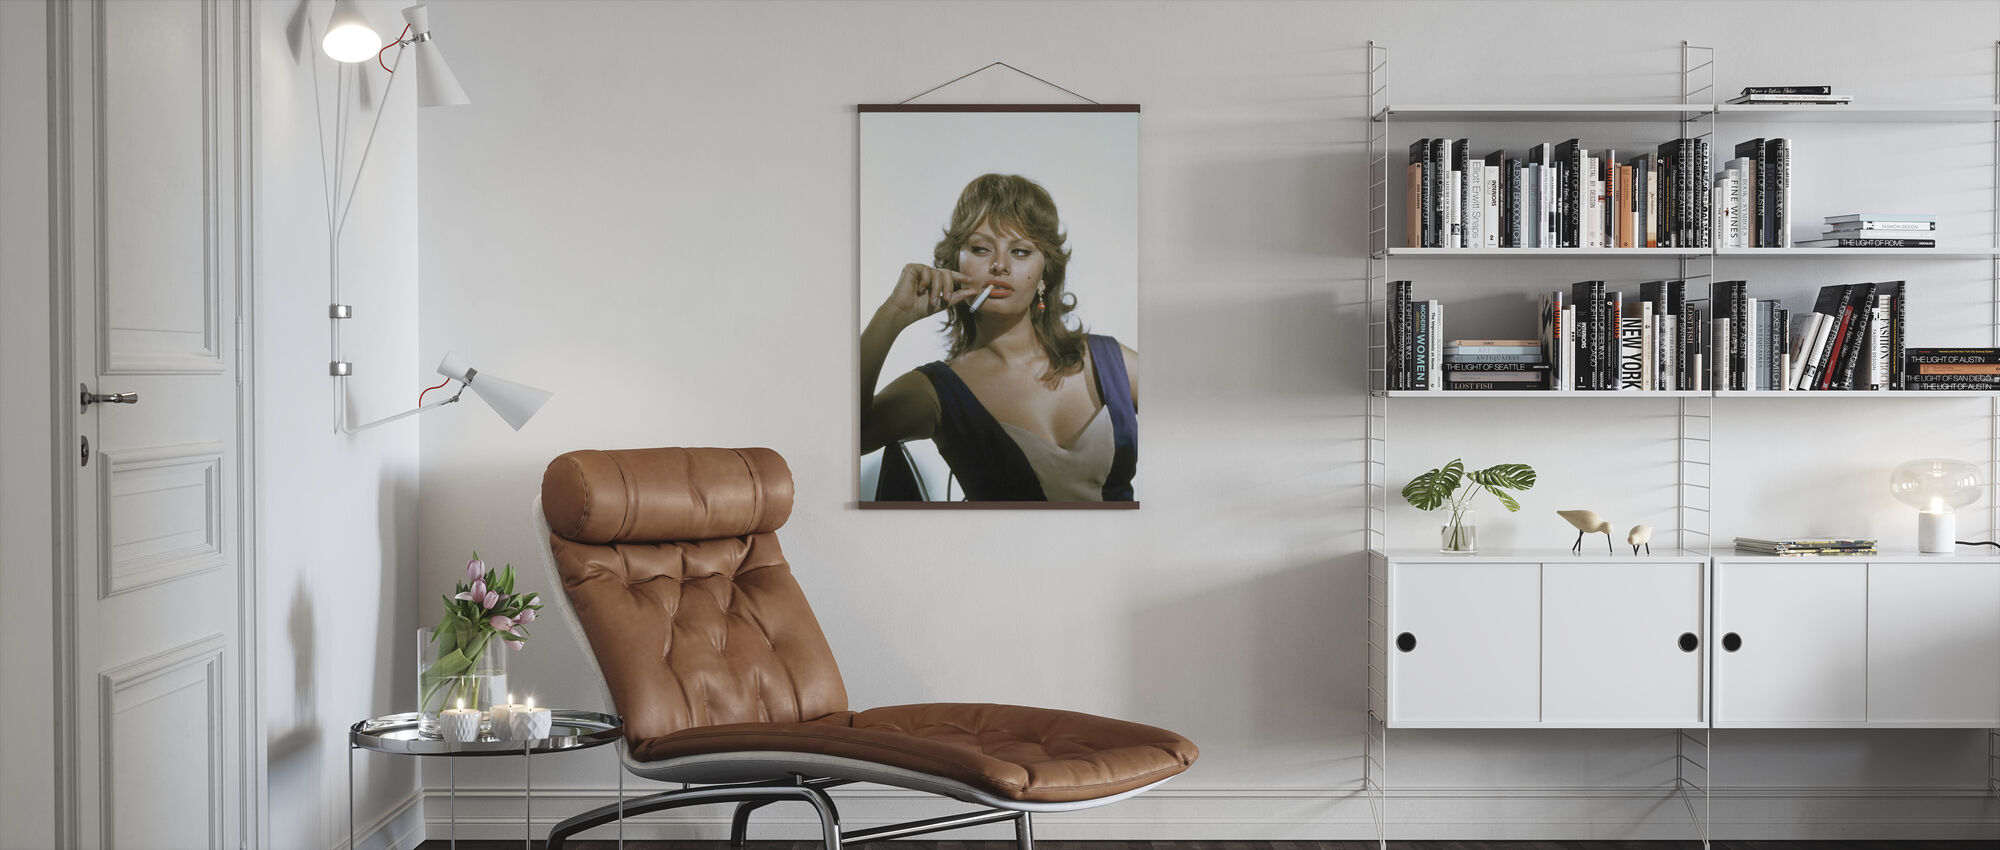 Sophia Loren - Plakat - Stue